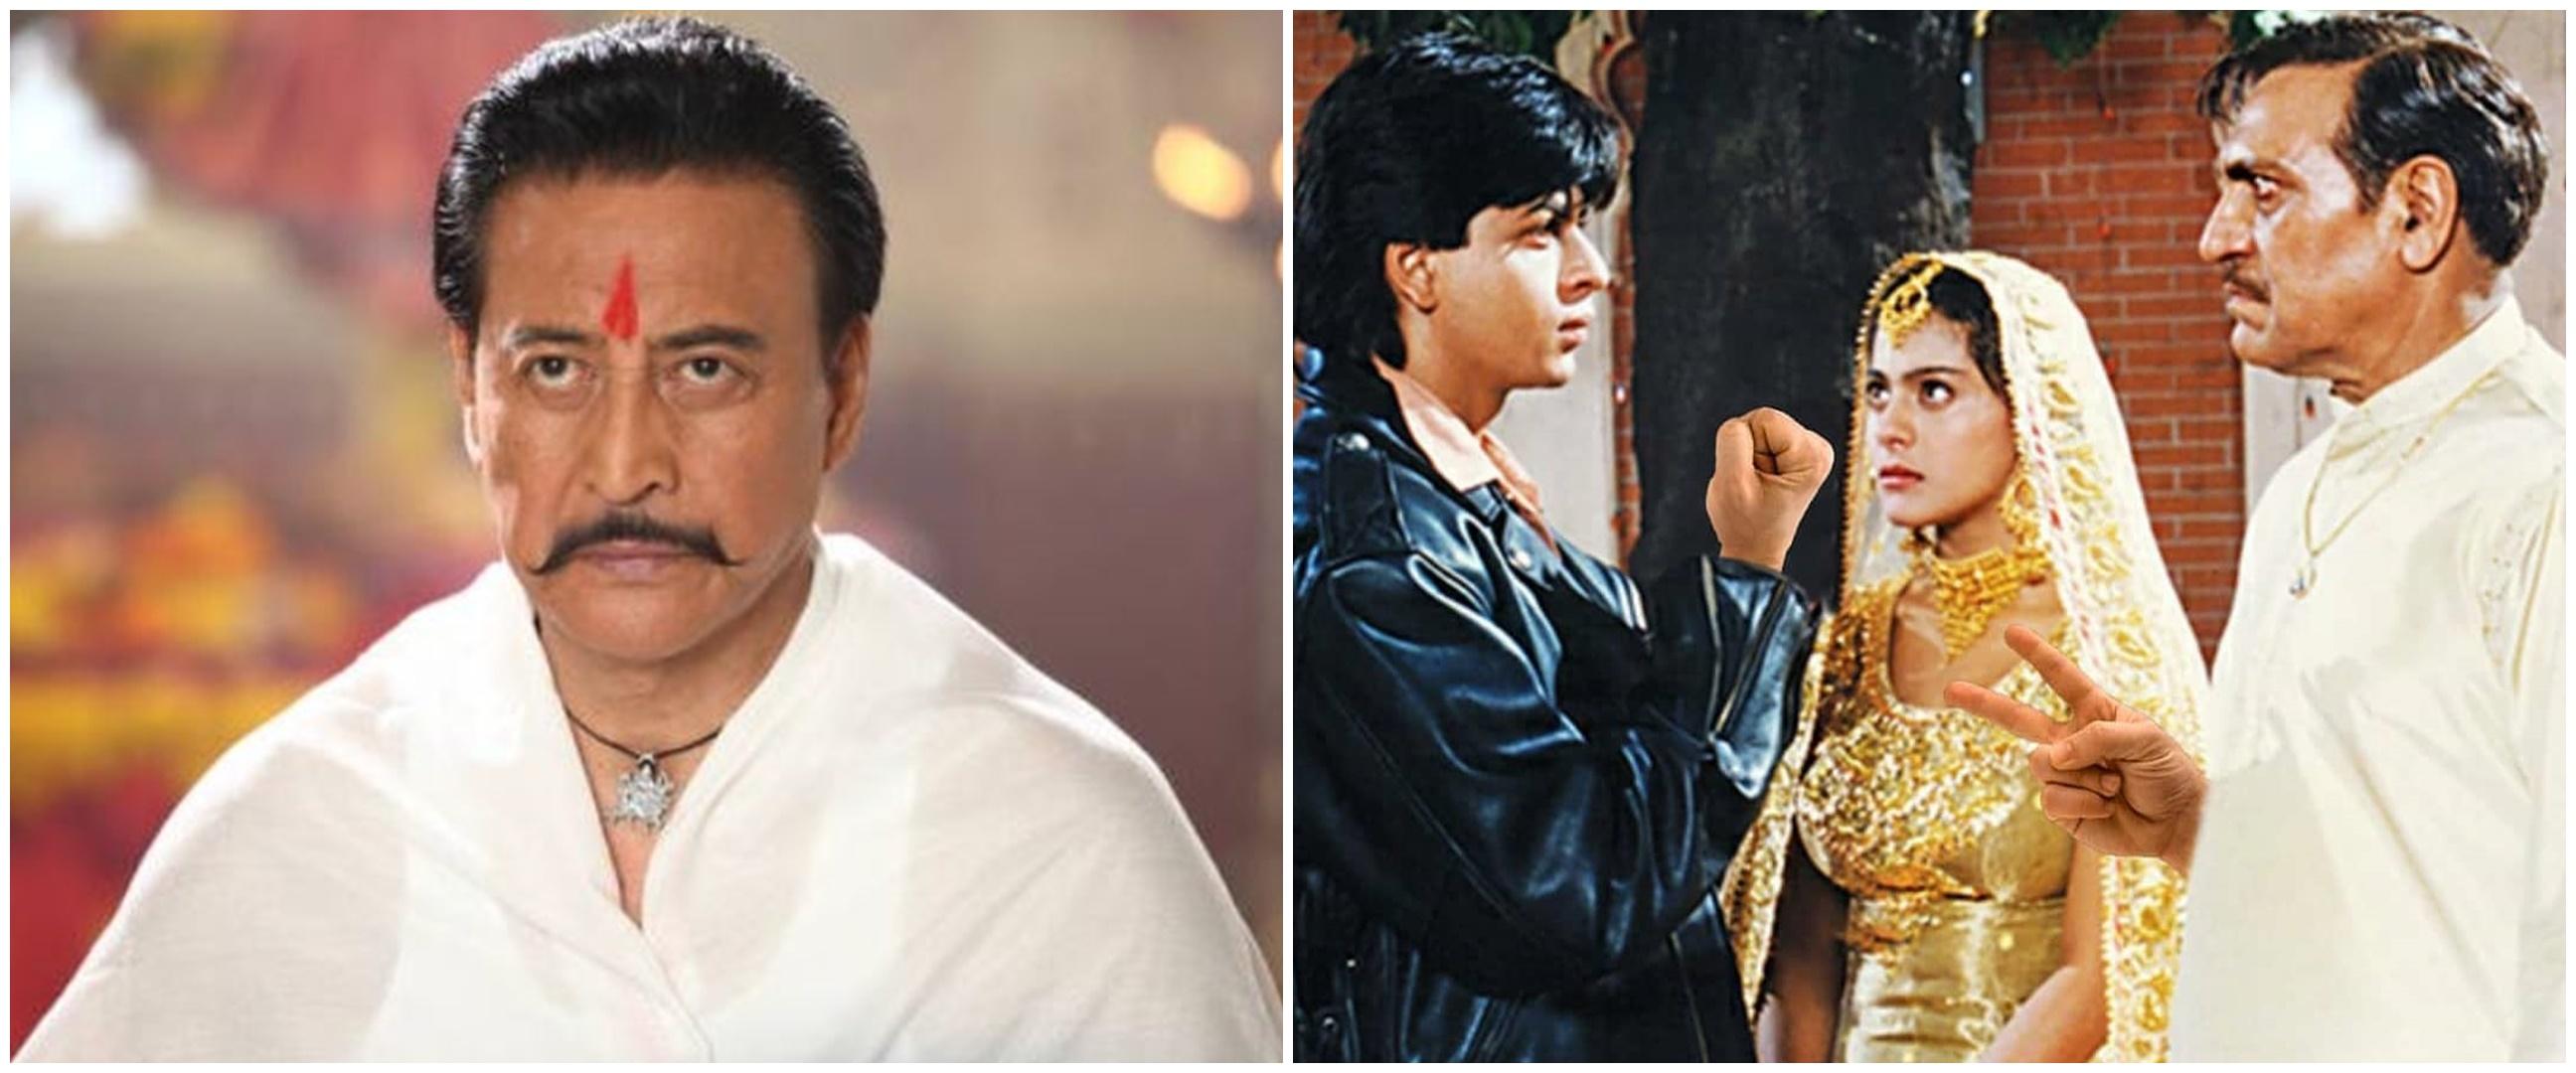 Kabar terkini 7 aktor Bollywood langganan peran penjahat